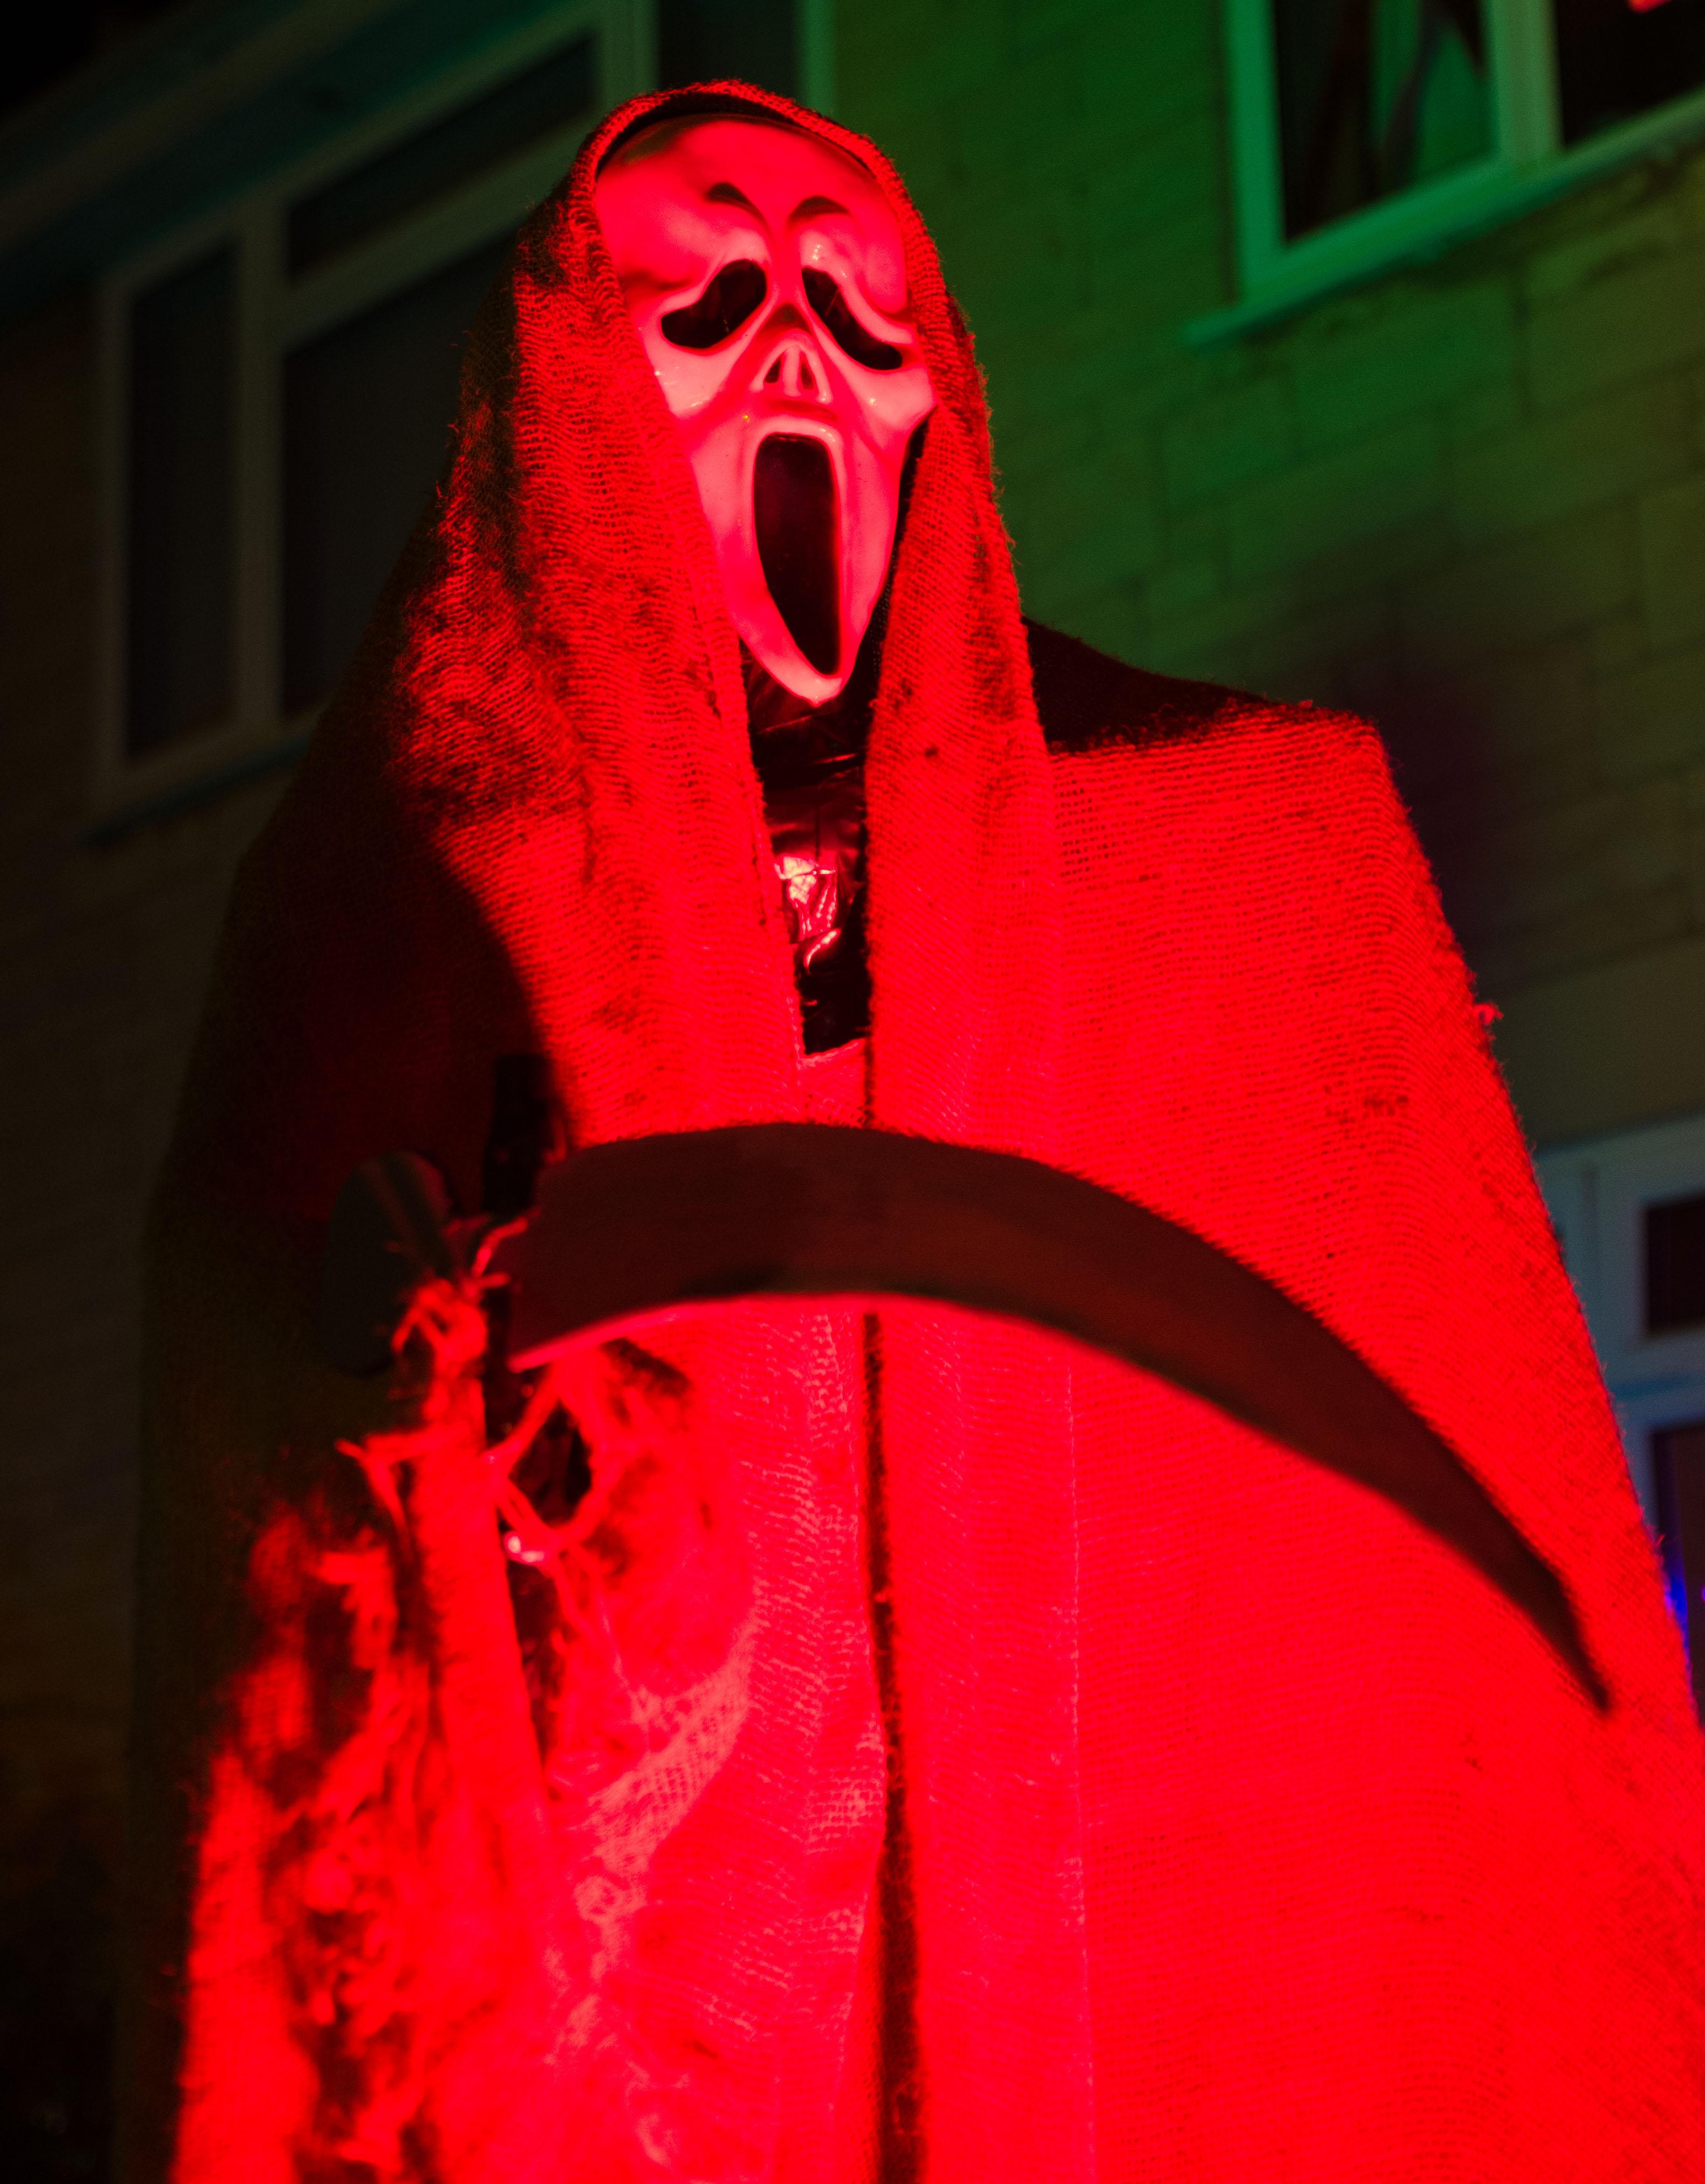 Picture of Spooky Grim Reaper!